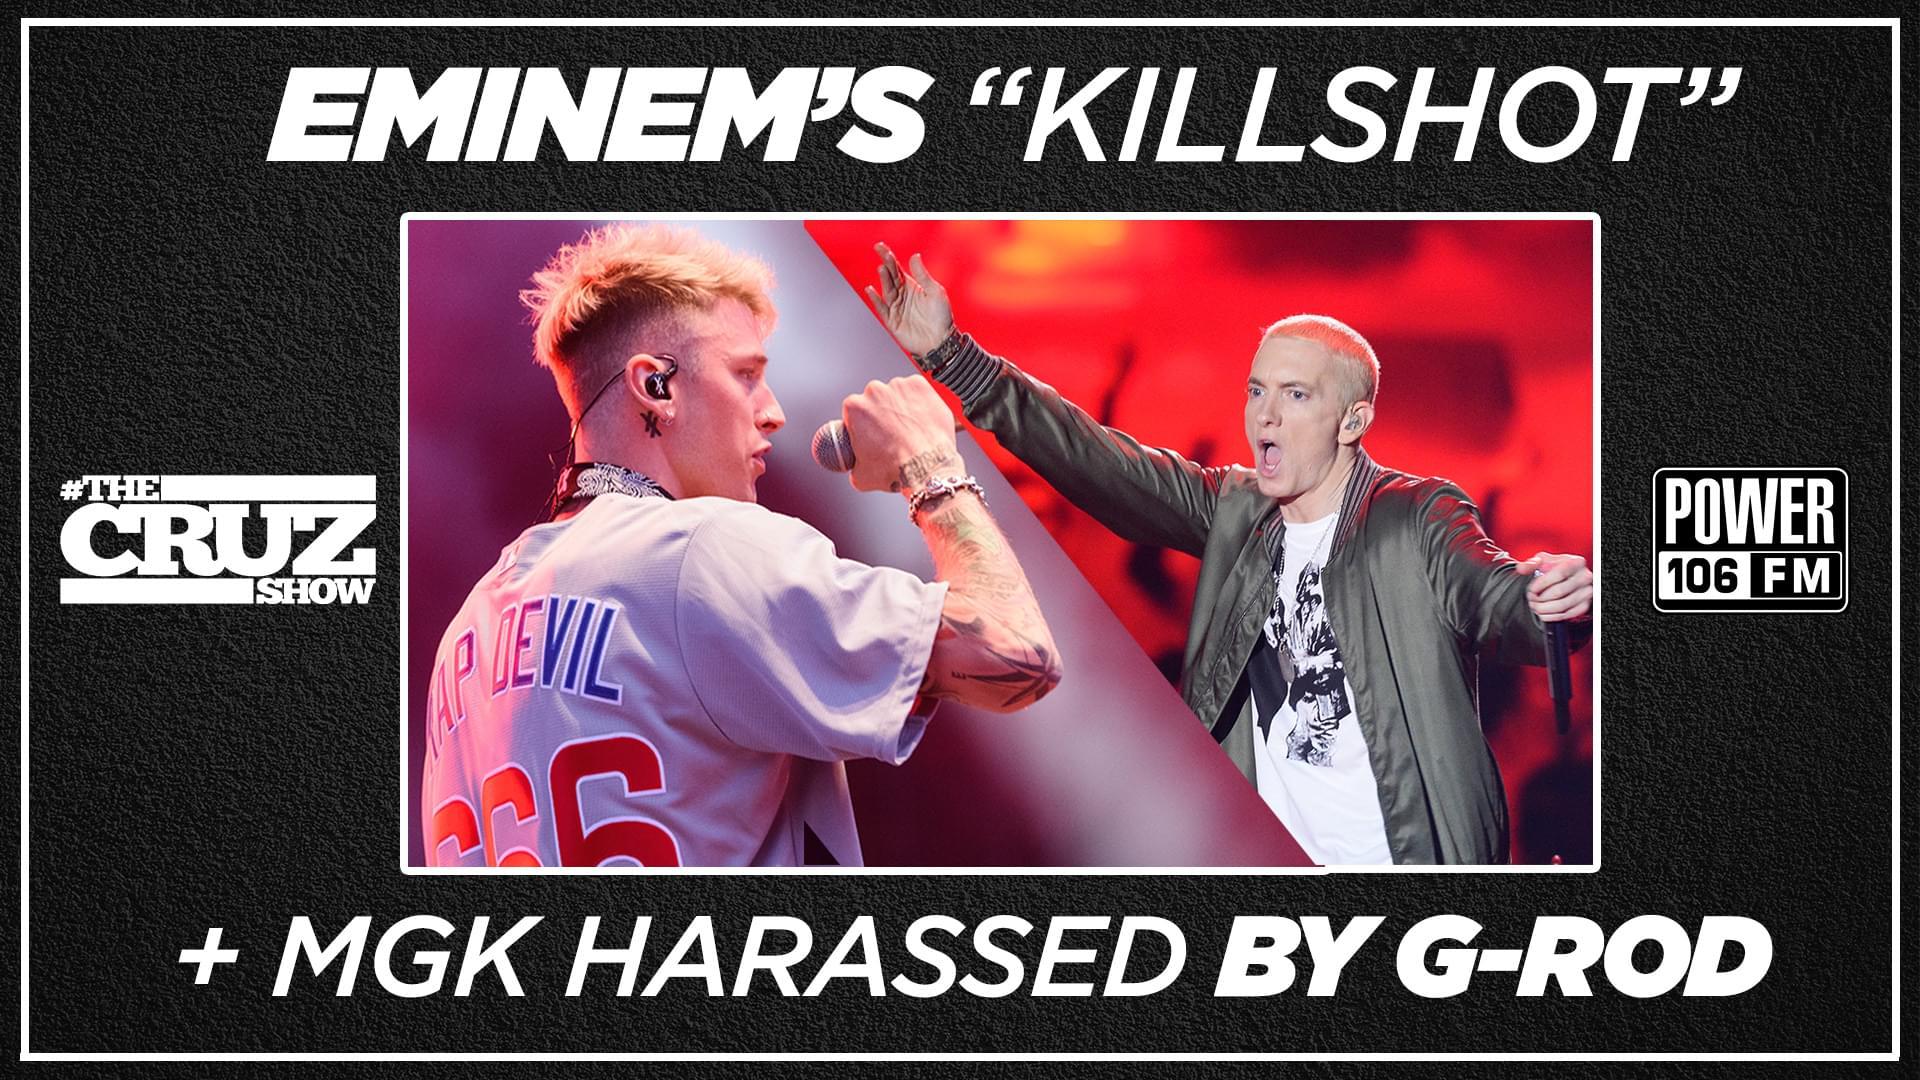 "Cruz Show + Van Latham Discuss ""Killshot"" + Actor G-Rod Harassed By MGK Crew [WATCH]"